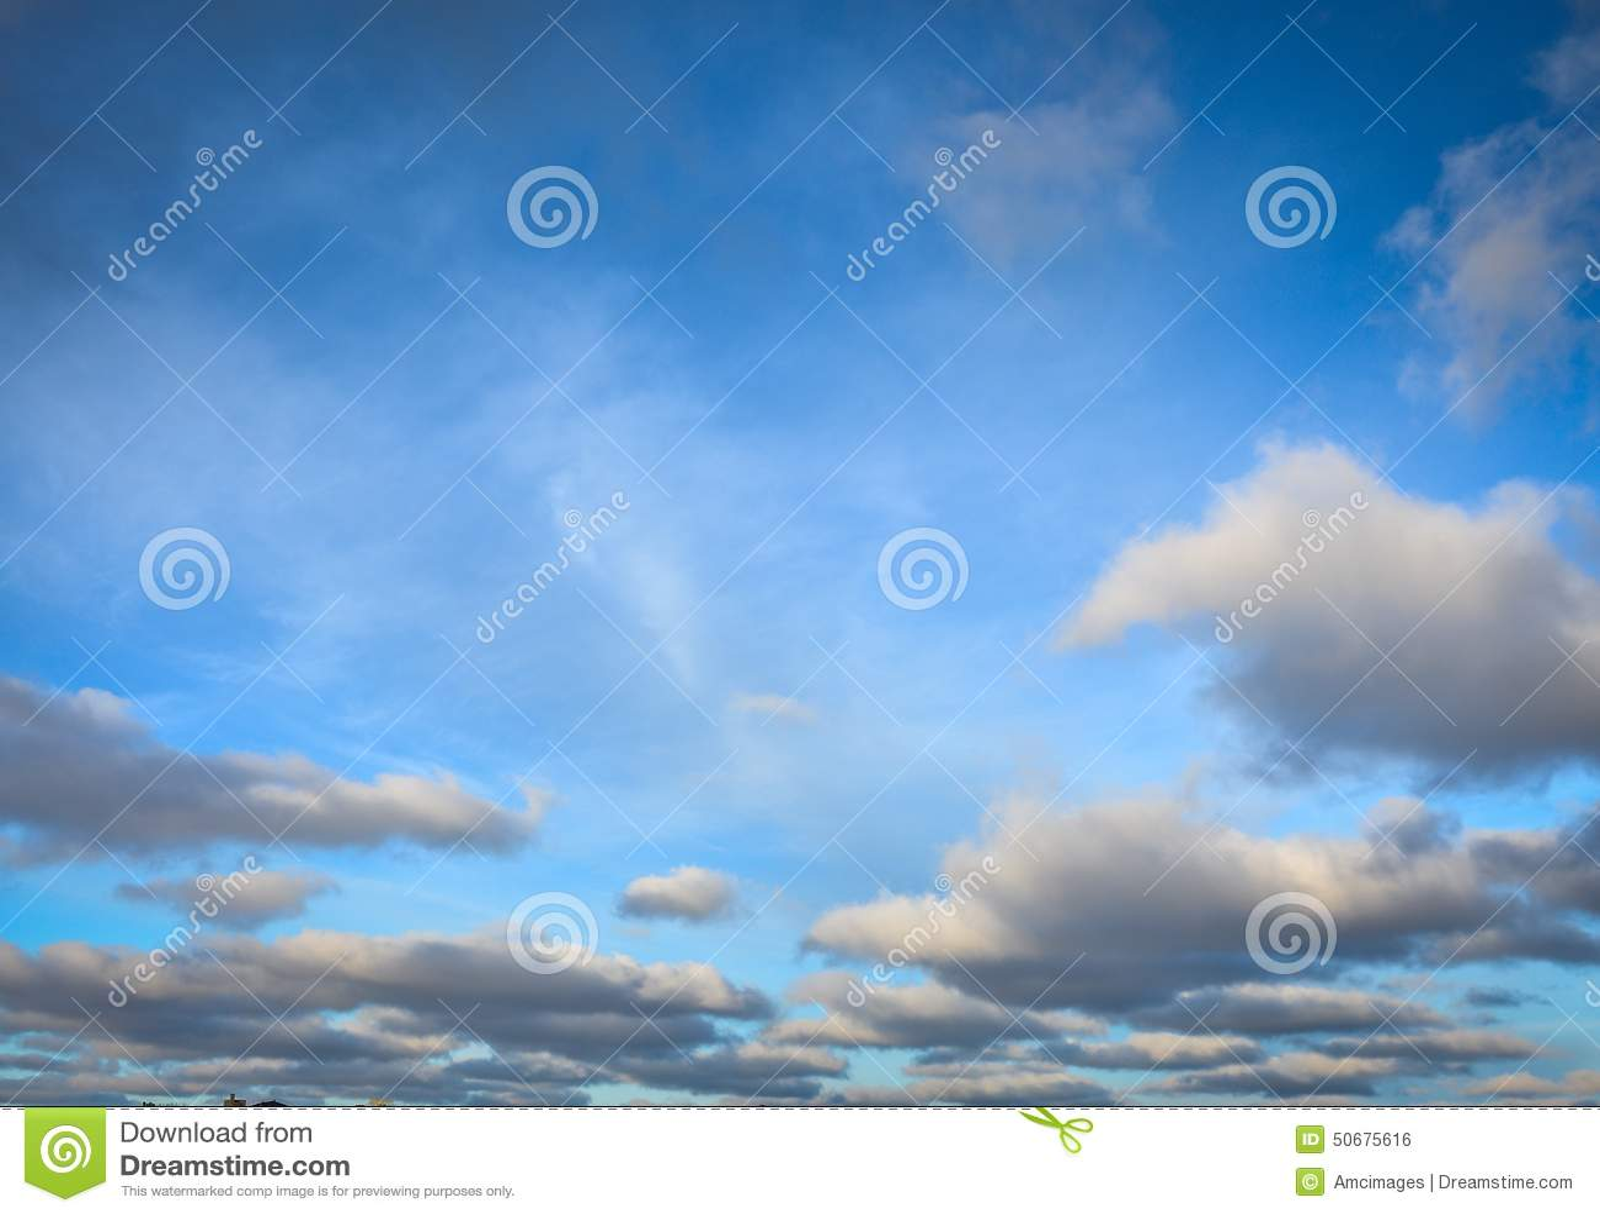 Download 与白色蓬松云彩的明亮的蓝天 库存照片. 图片 包括有 天空, 威斯康辛, 蓝色, 云彩, 天堂般, 照亮 - 50675616